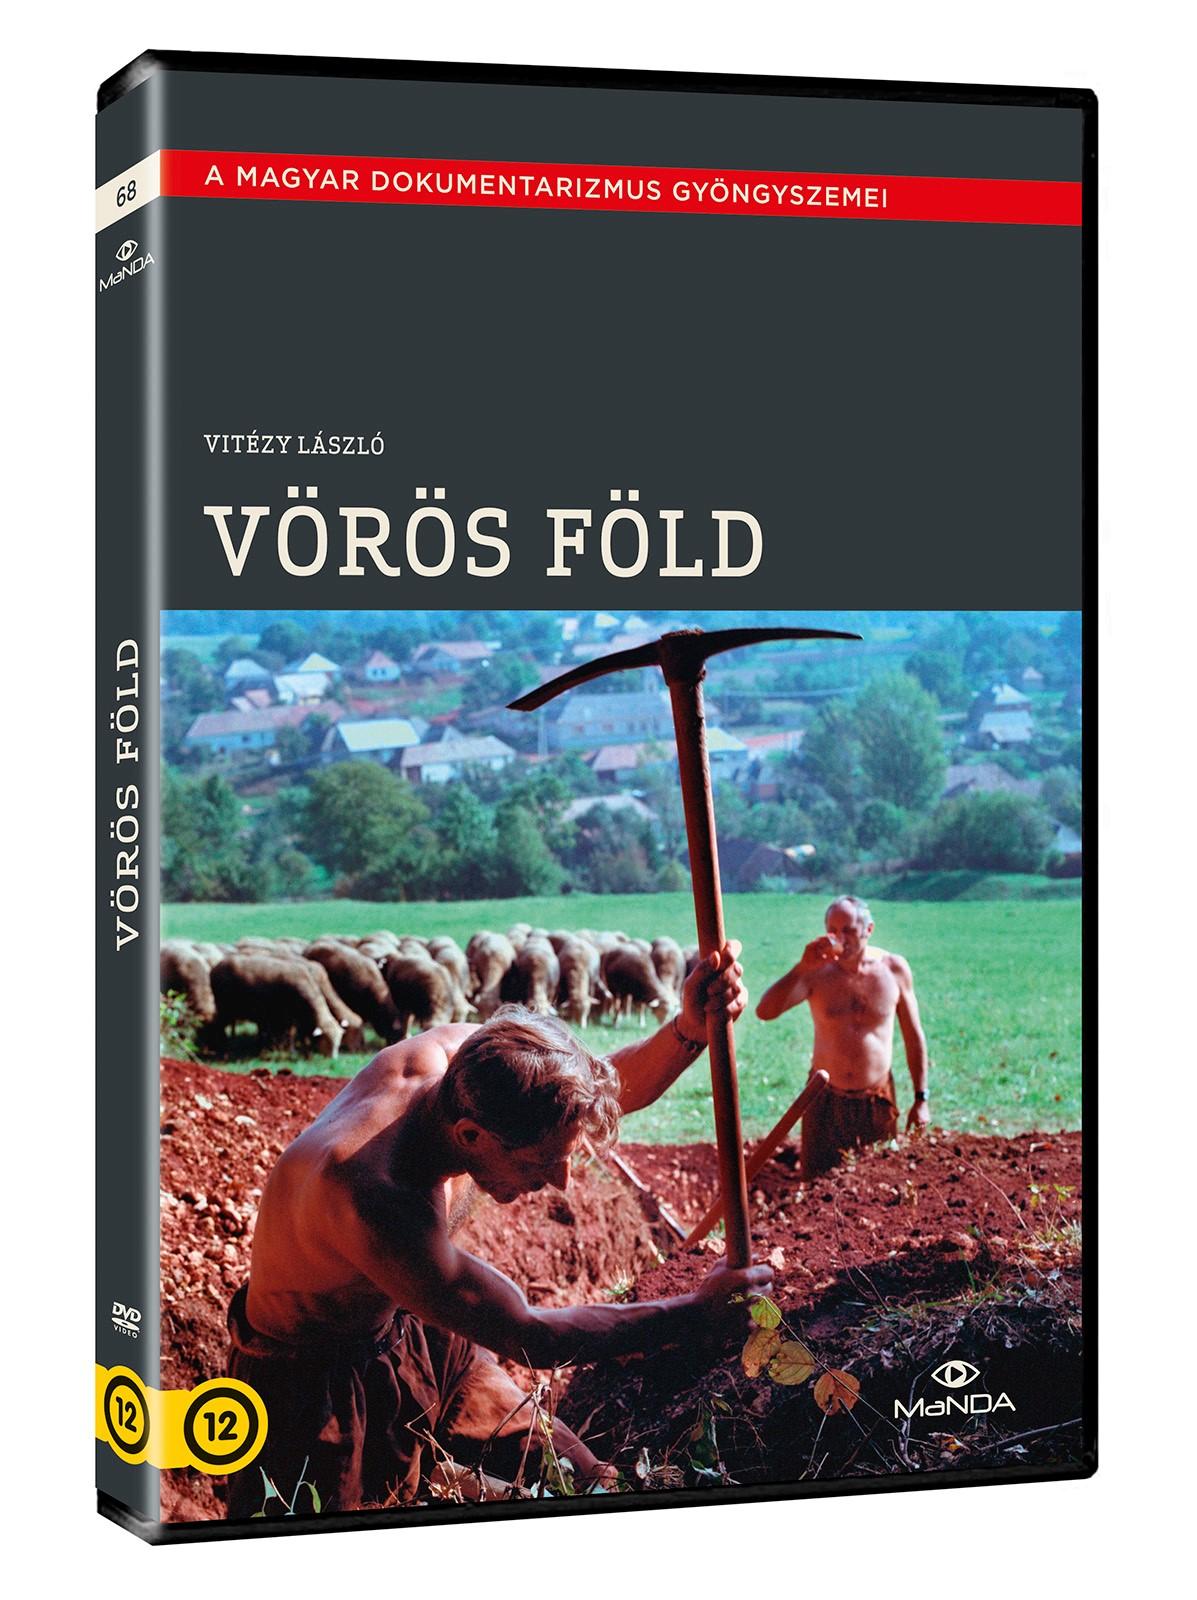 vorosfold_3d